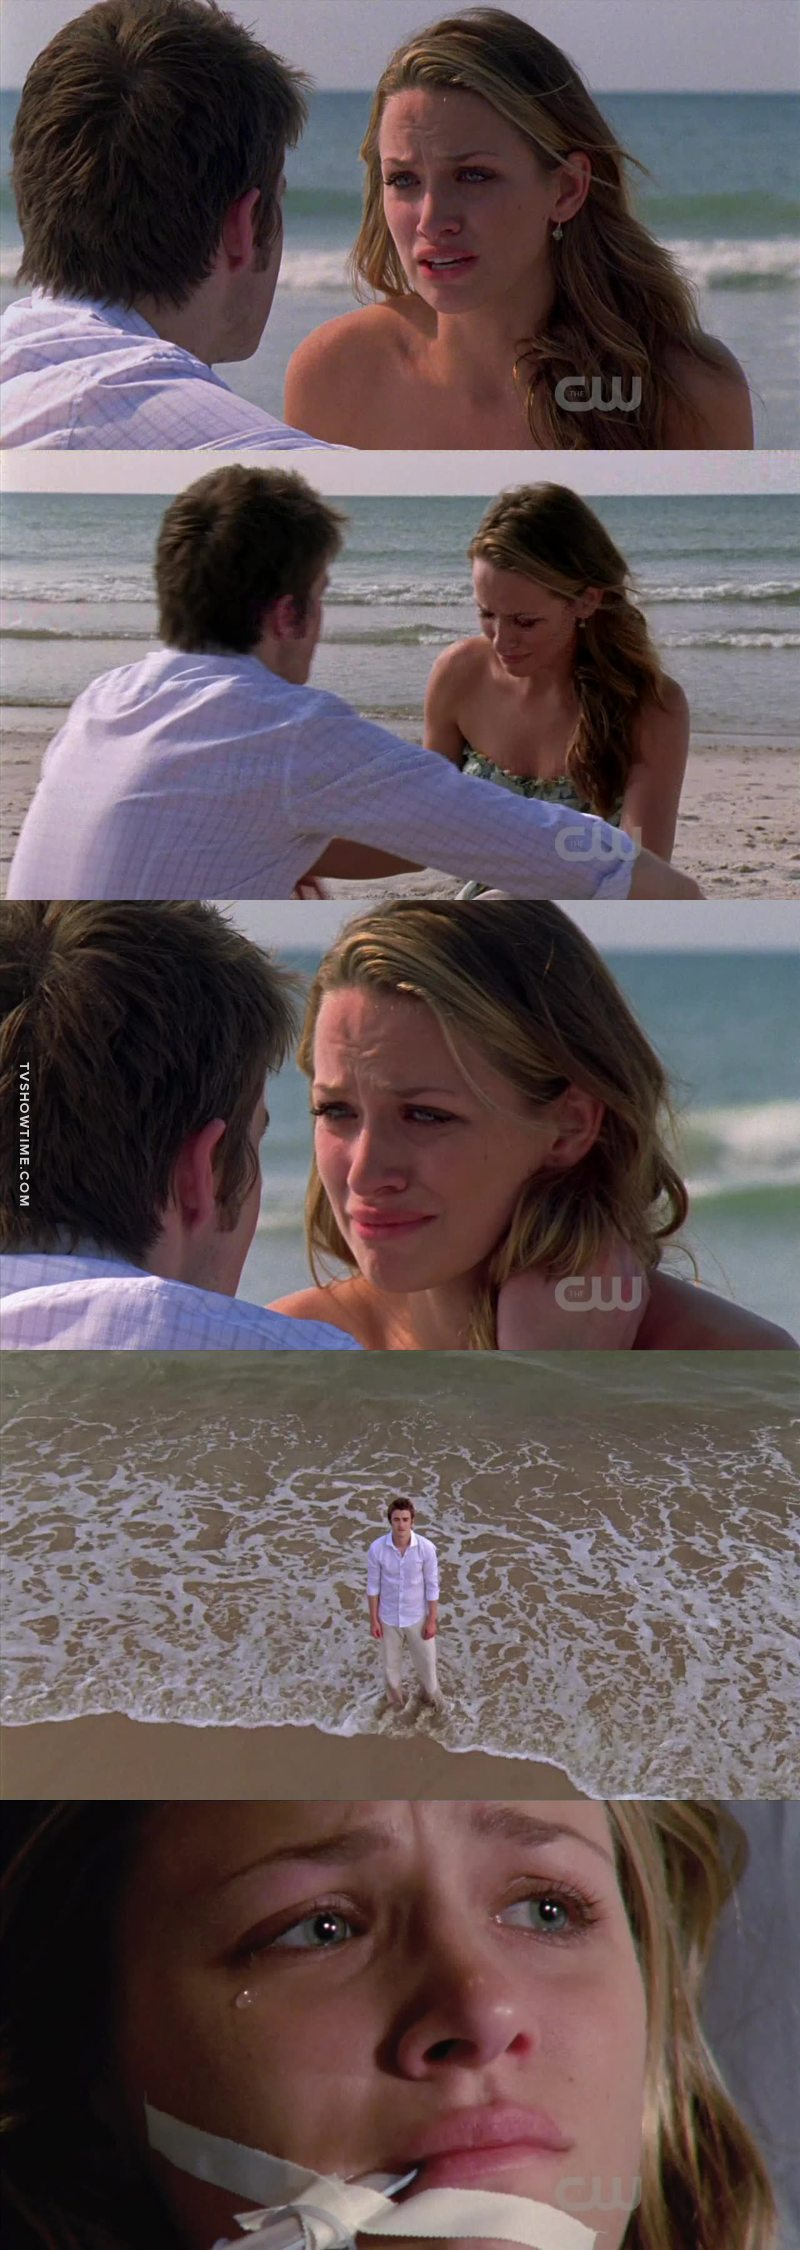 This scene litteraly broke my heart 😭😭 Thanks god she's alive